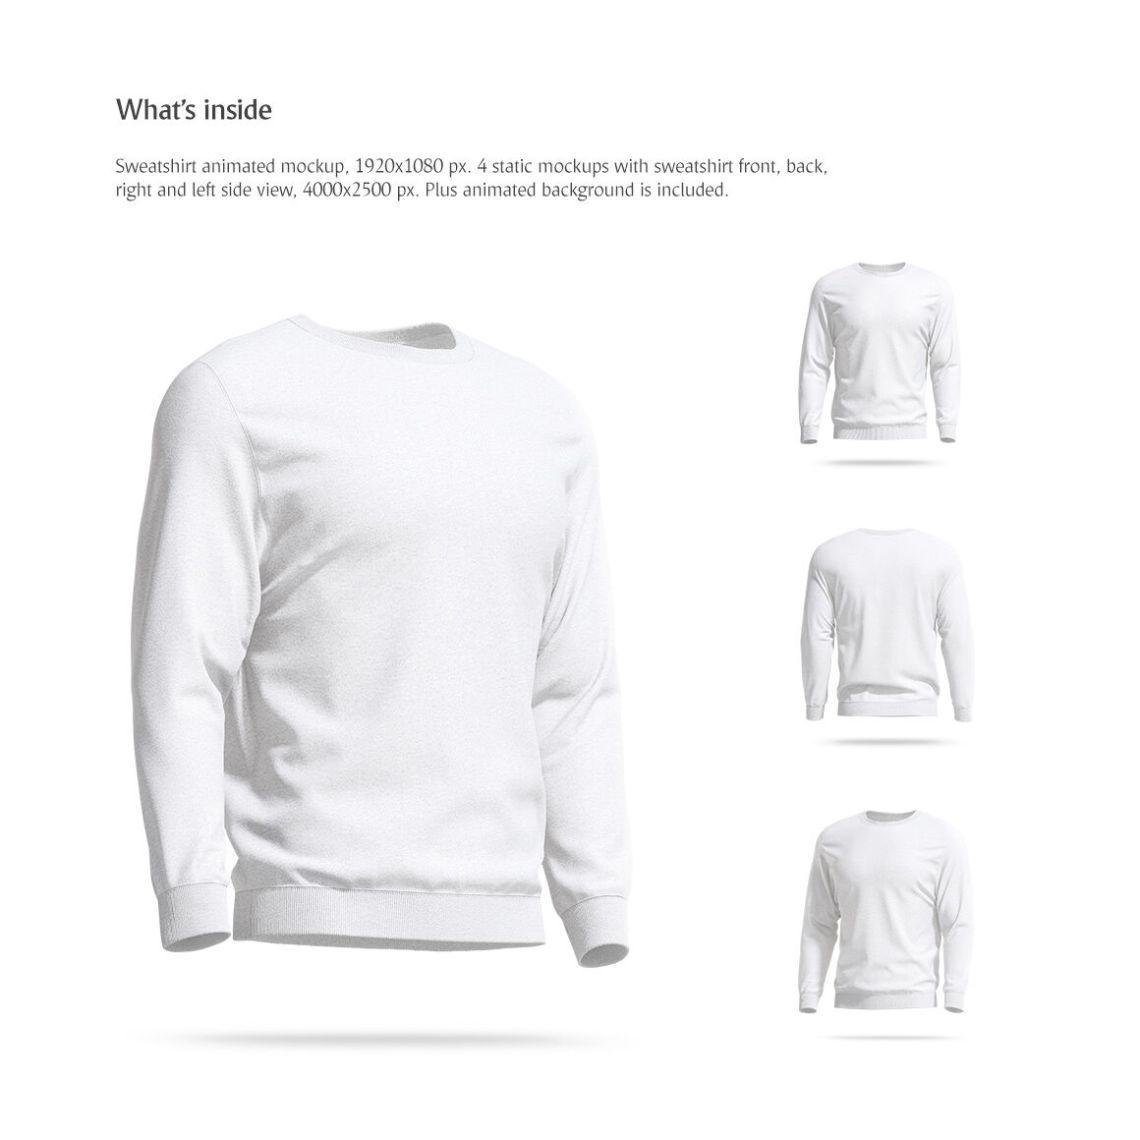 Download Jacket Mockup Psd Free Yellow Images